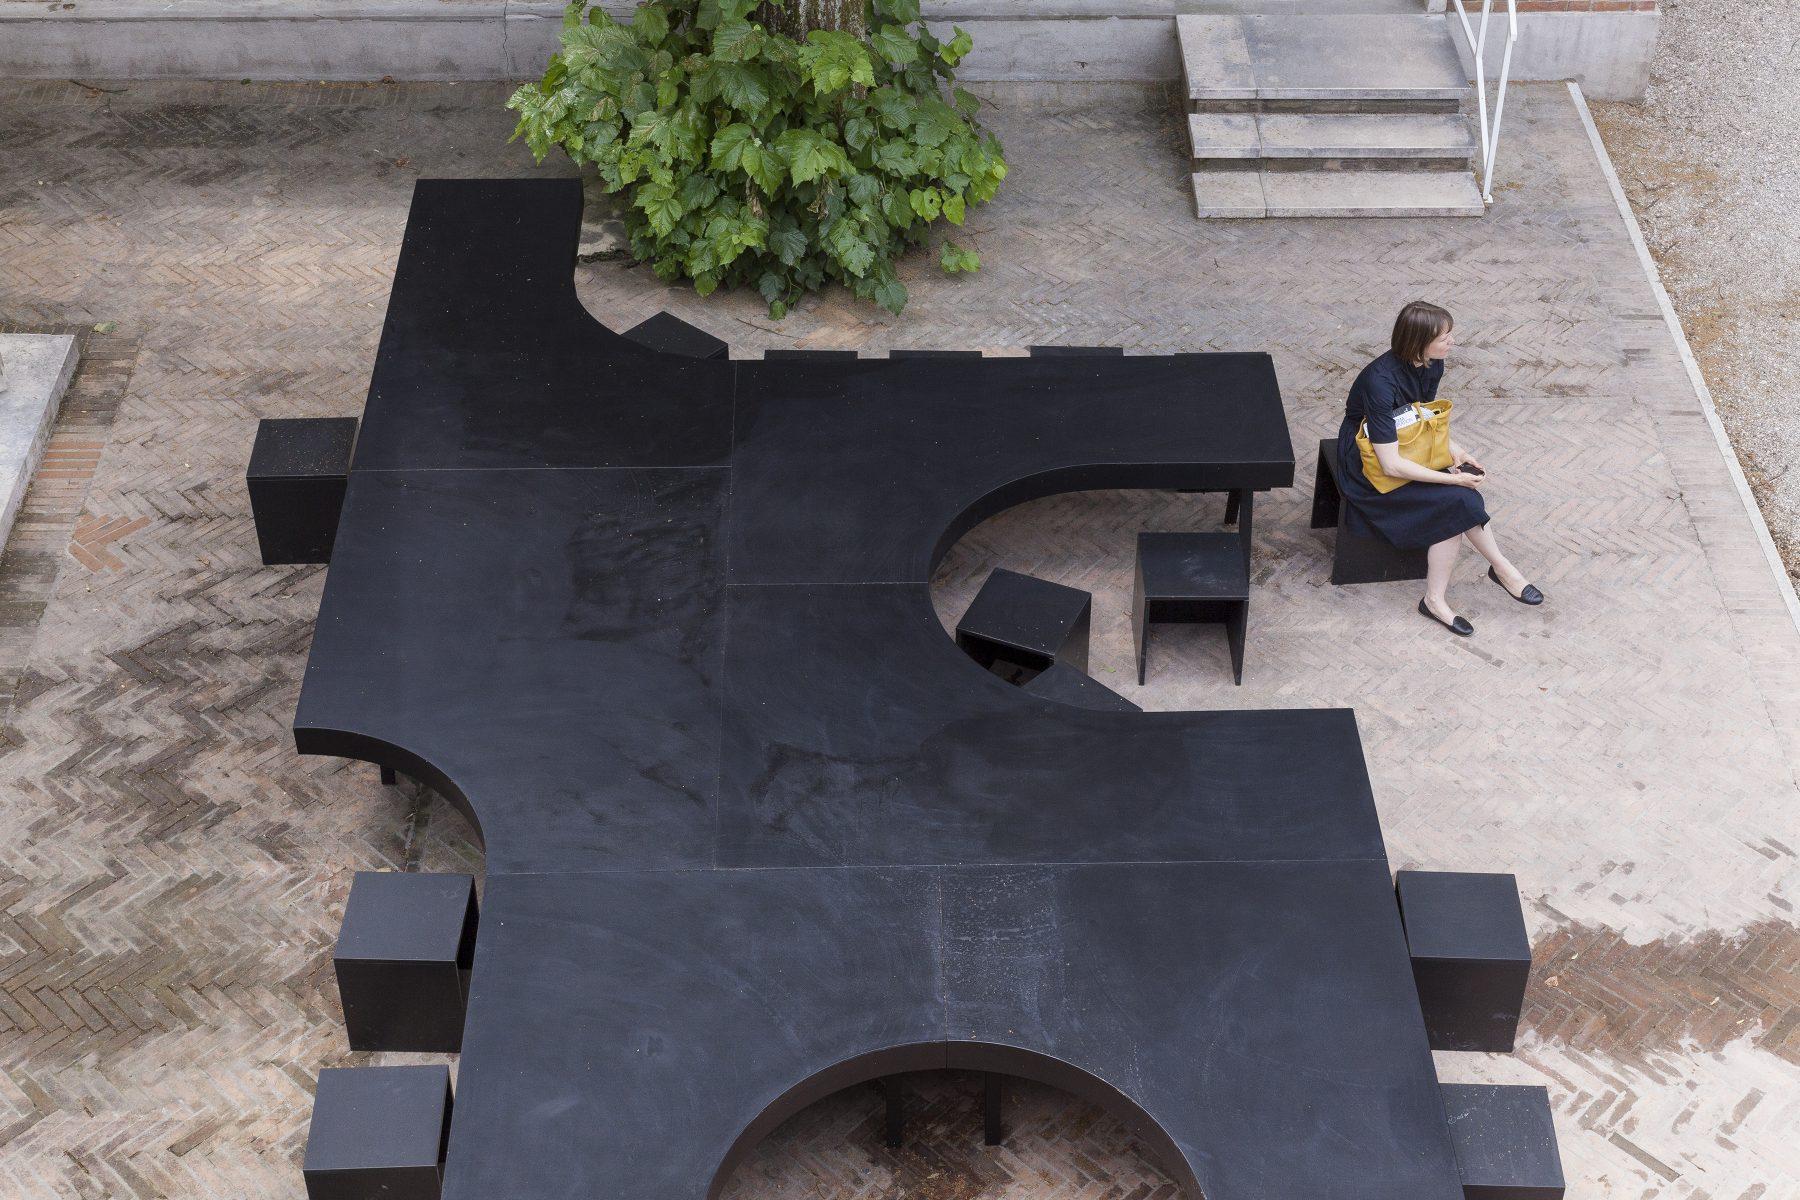 Leong Leong – Leong Leong is an award-winning architecture